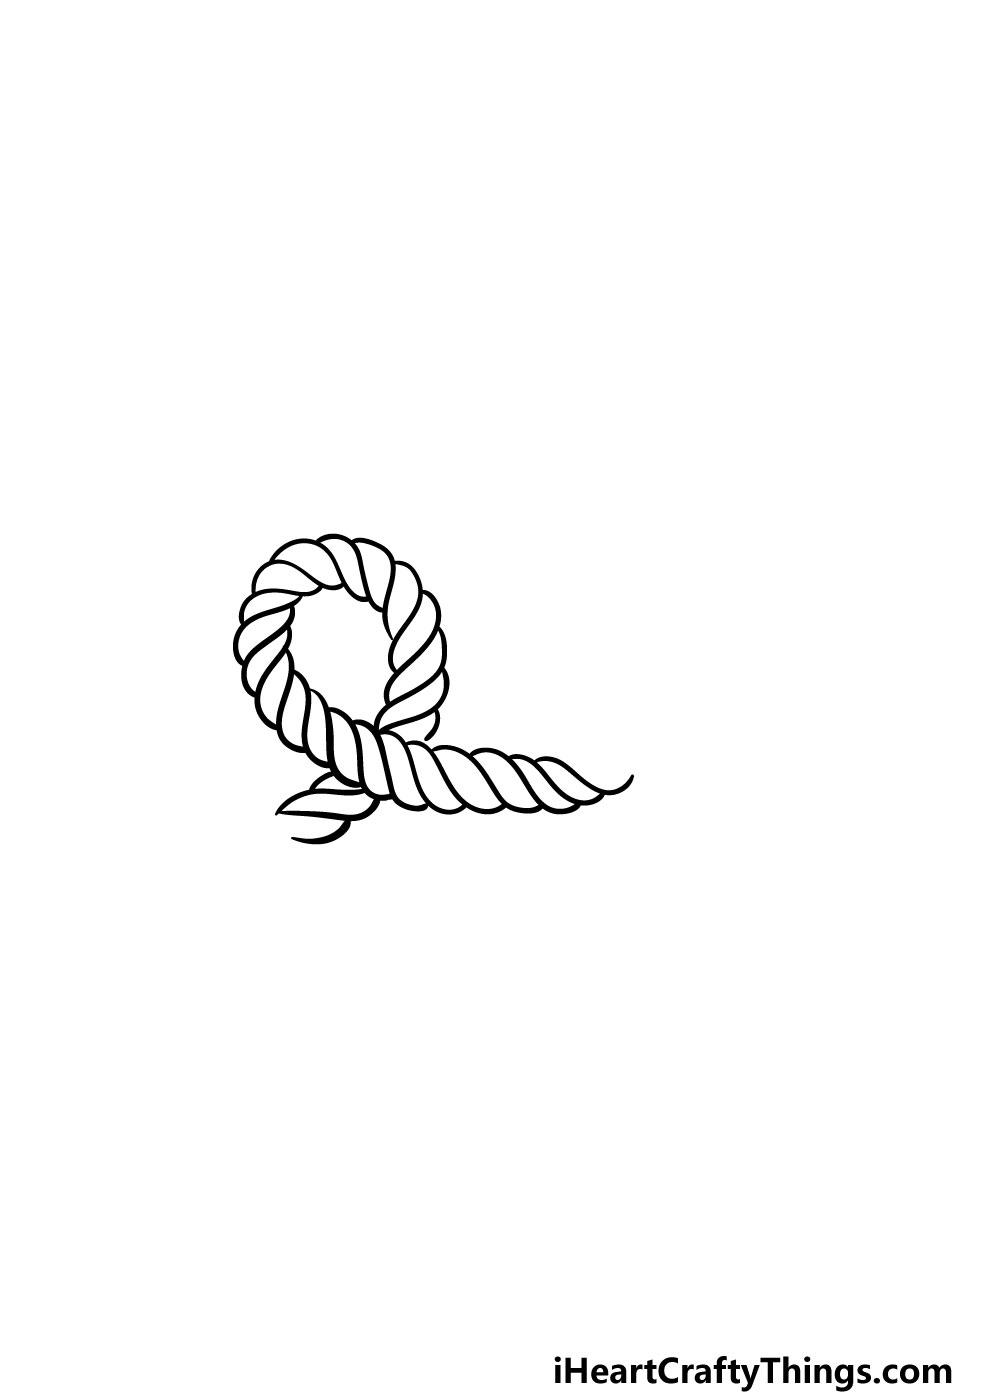 drawing rope step 3